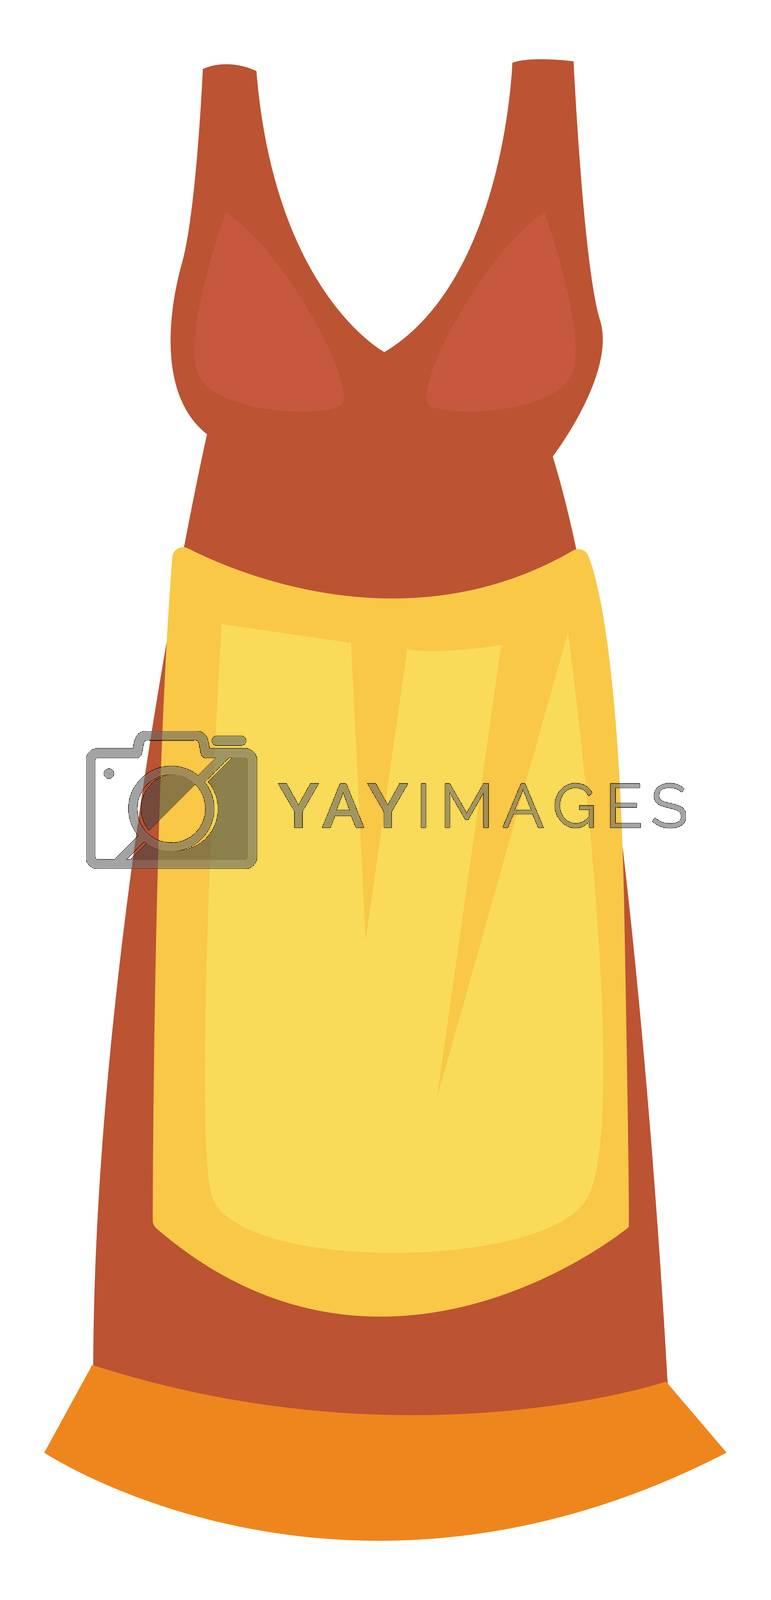 Kitchen apron, illustration, vector on white background